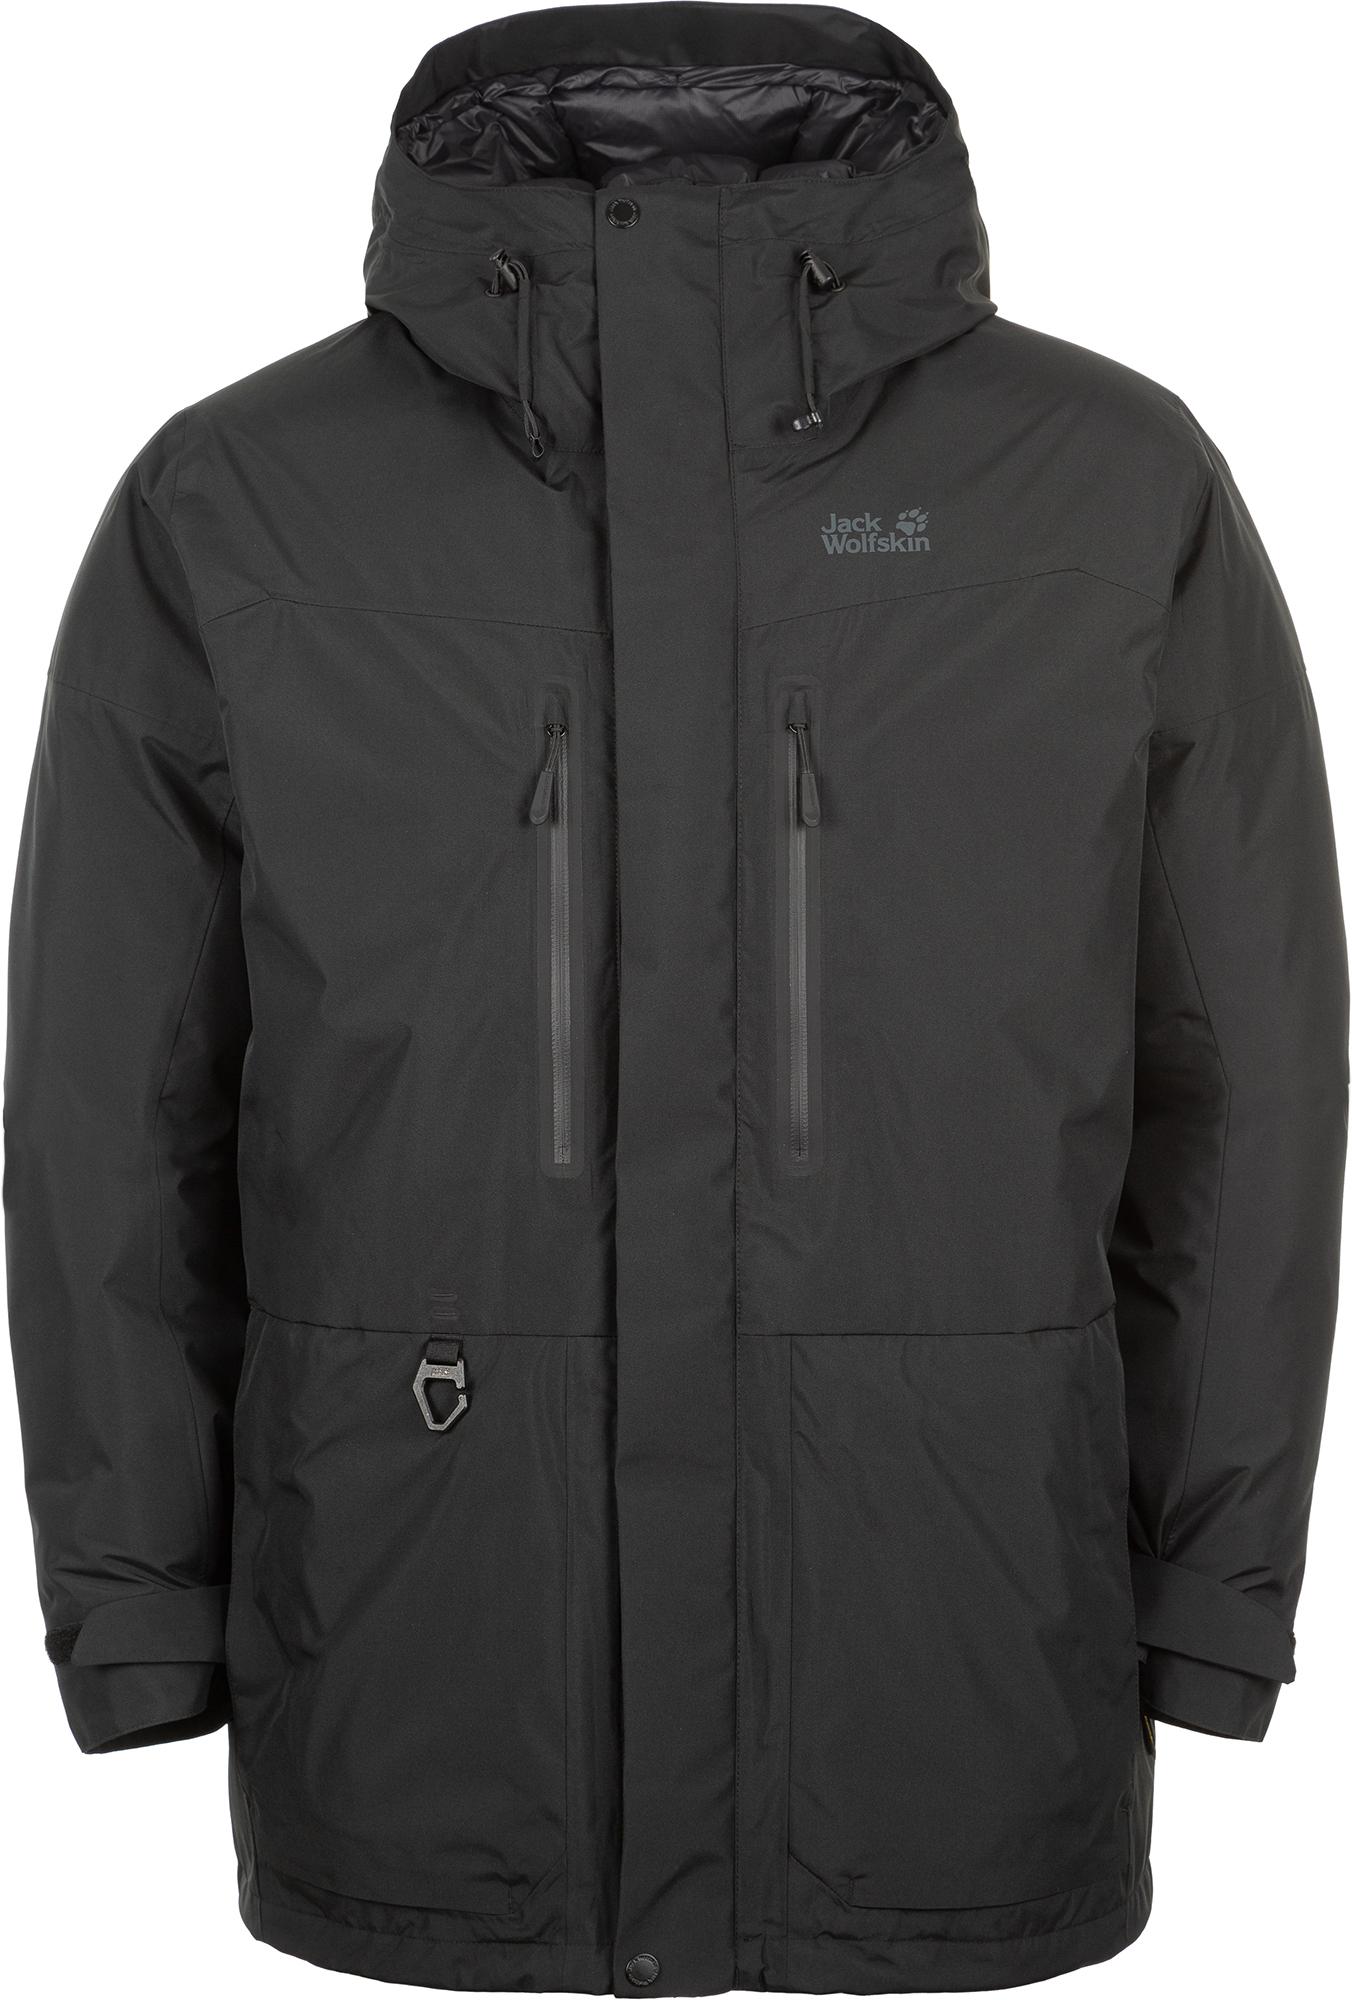 Jack Wolfskin Куртка пуховая мужская North Ice, размер 58